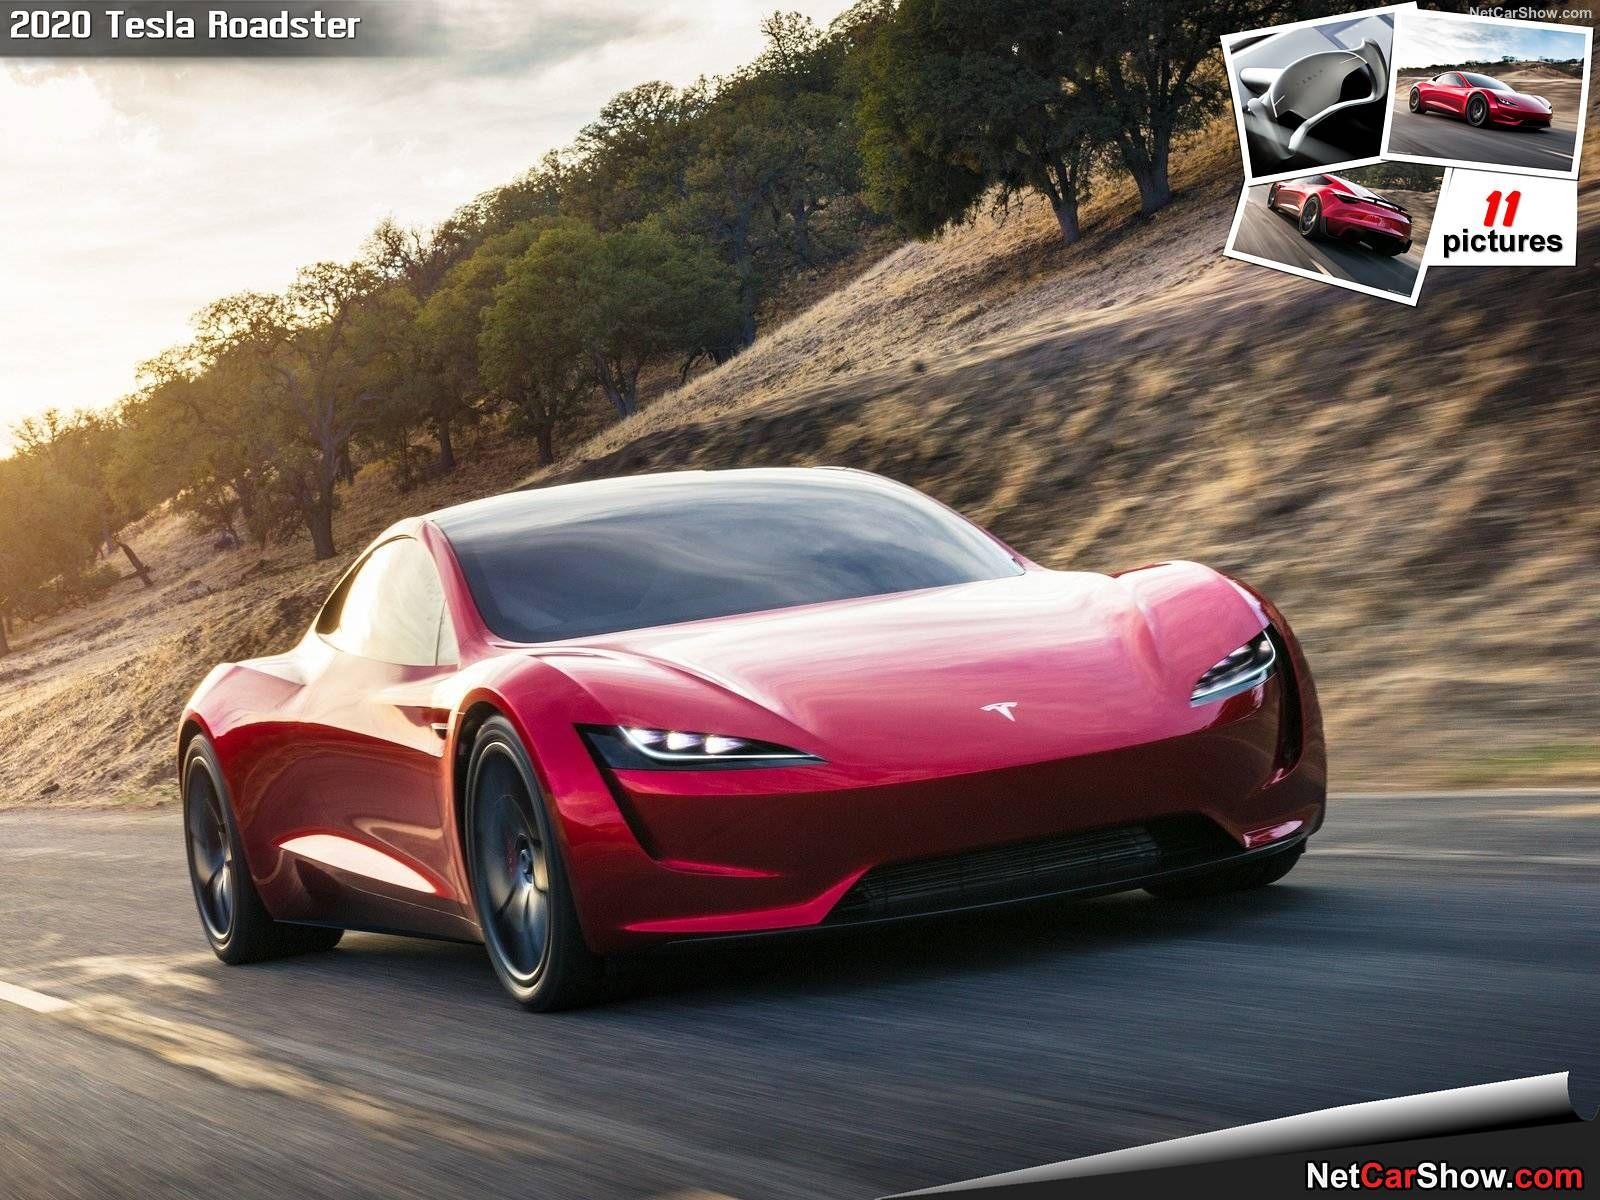 Wallpaper HD Tesla Roadster 2020 2021 Live Wallpaper HD Tesla 1600x1200